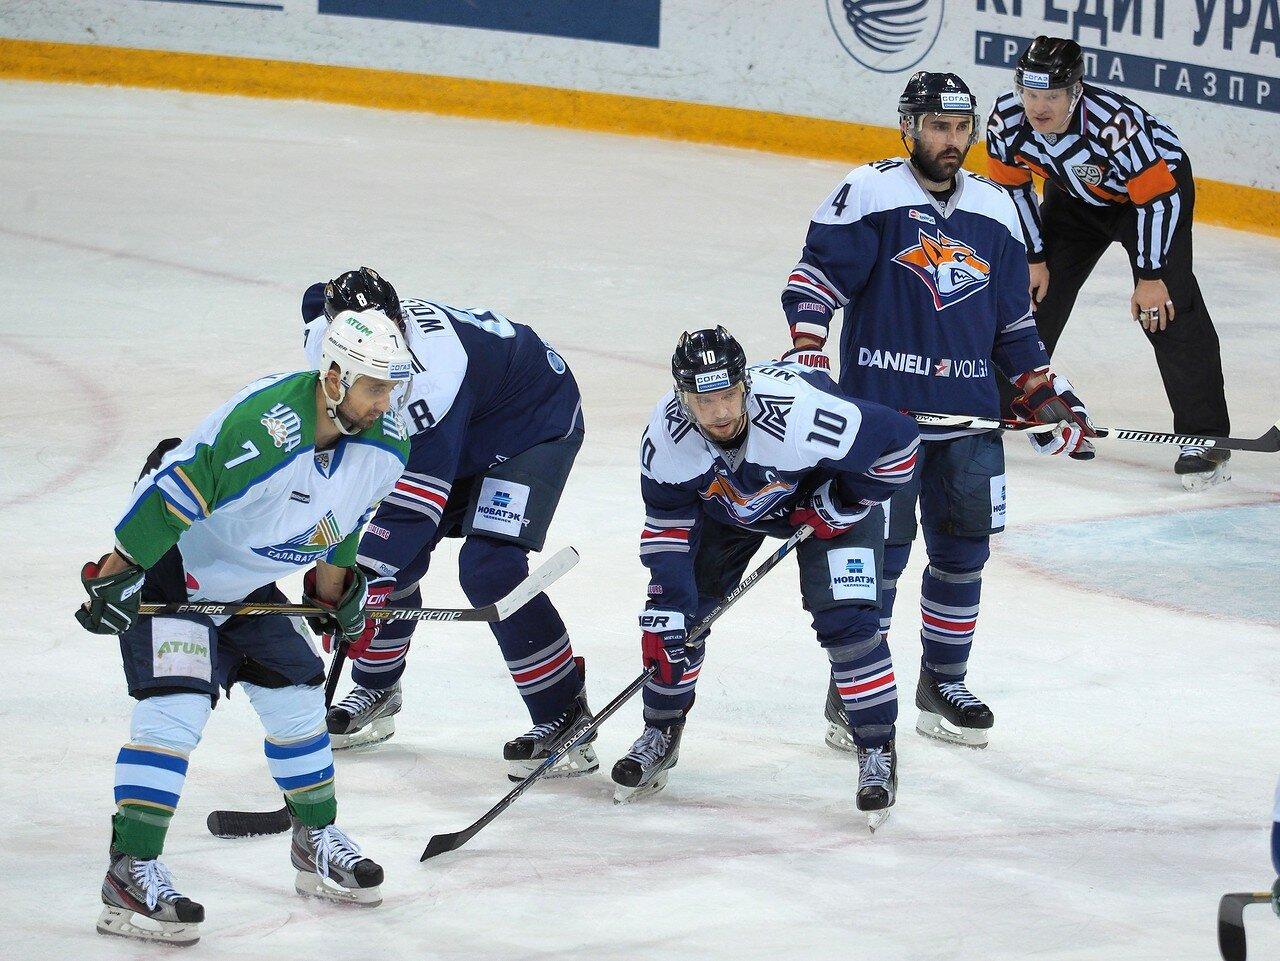 74Плей-офф 2016 Восток Финал Металлург - Салават Юлаев 31.03.2016